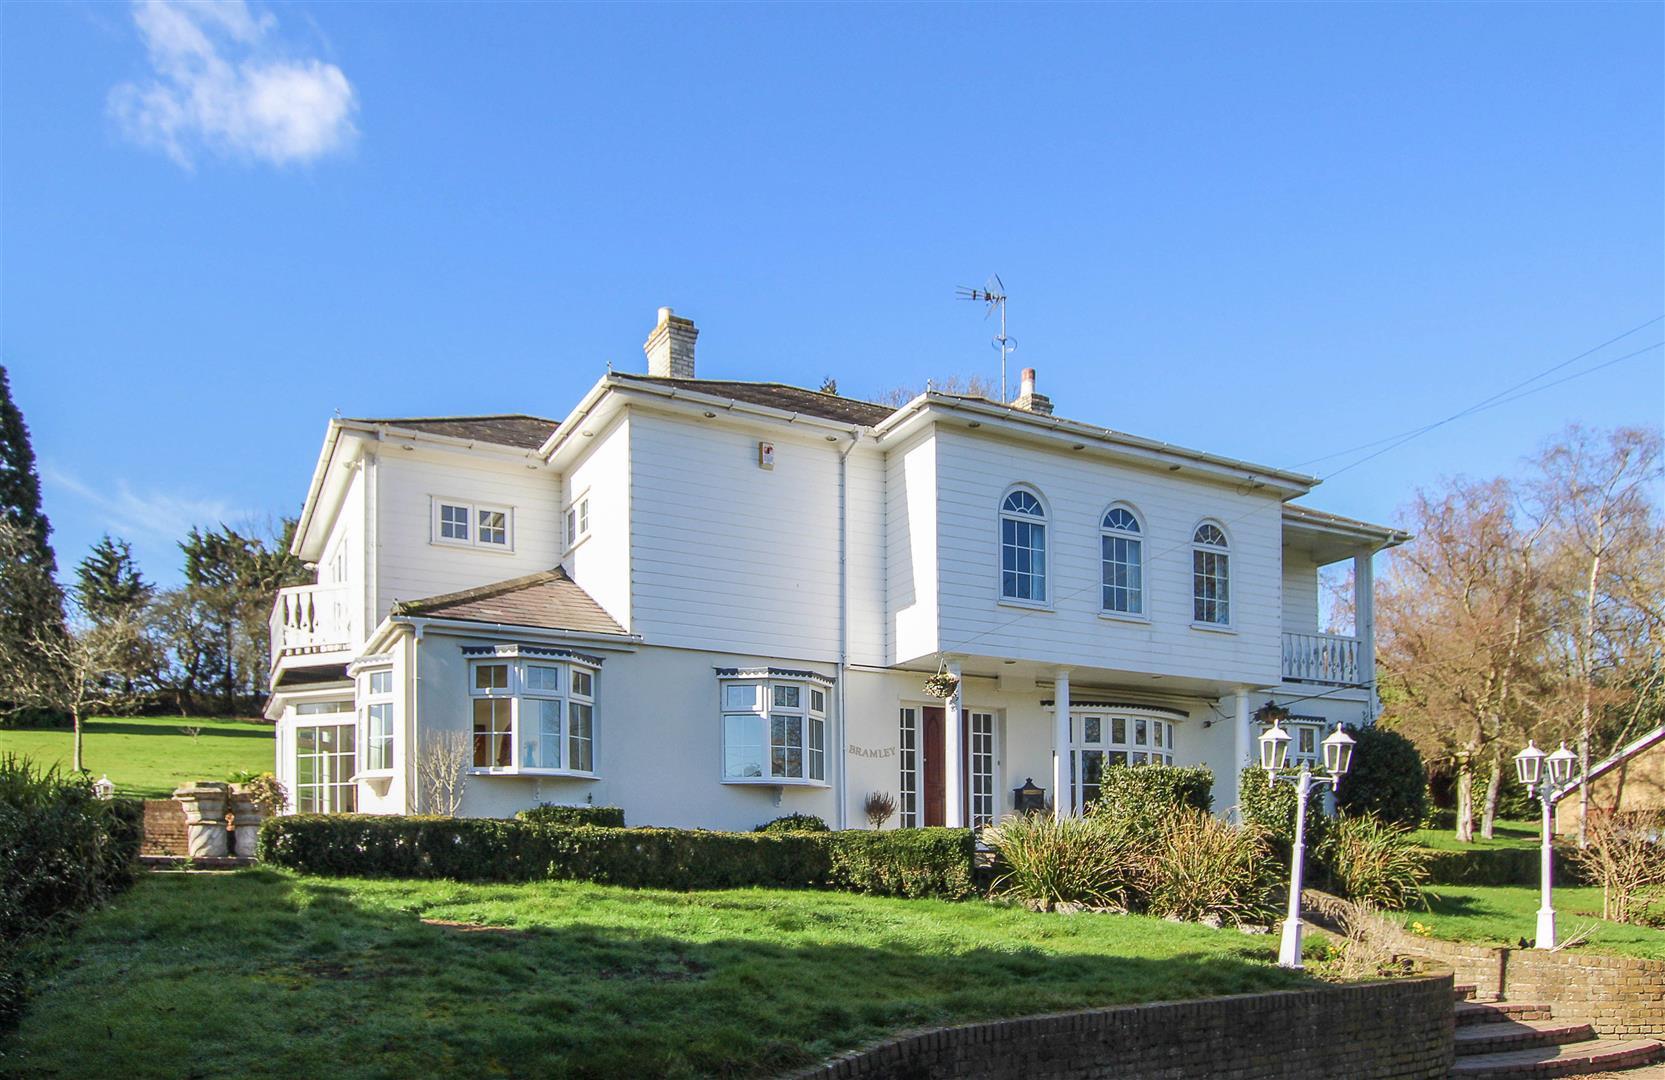 Childerditch Street, Little Warley – Keith Ashton Signature Home